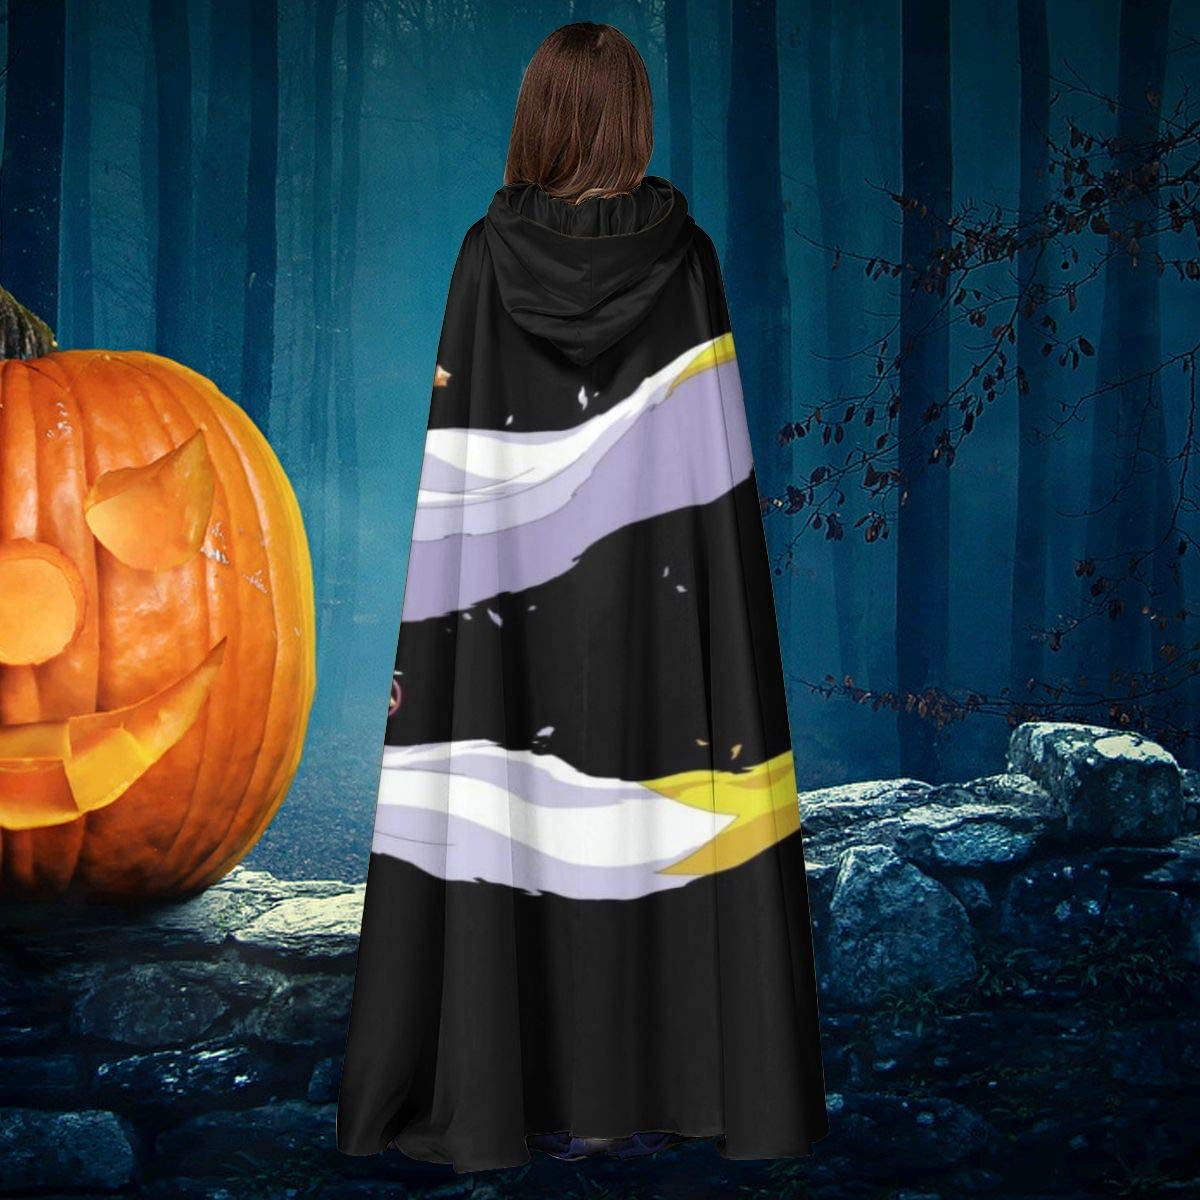 NULLYTG Carcassonne Power To The Meeple - Capa de Disfraz de Bruja con Capucha para Halloween: Amazon.es: Productos para mascotas